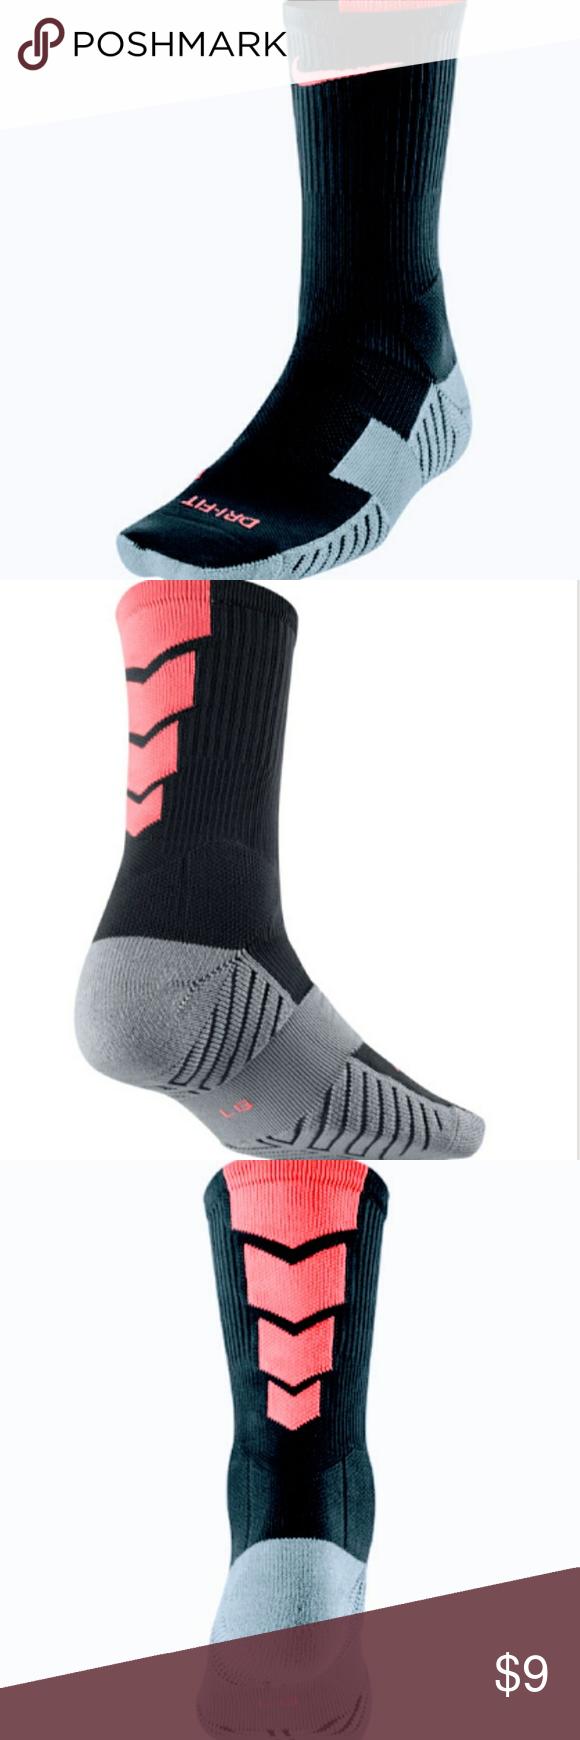 9c2375ec6 Nike Drifit Stadium Crew Socks Youth/Women 1 pair of Nike Stadium Soccer  Socks.